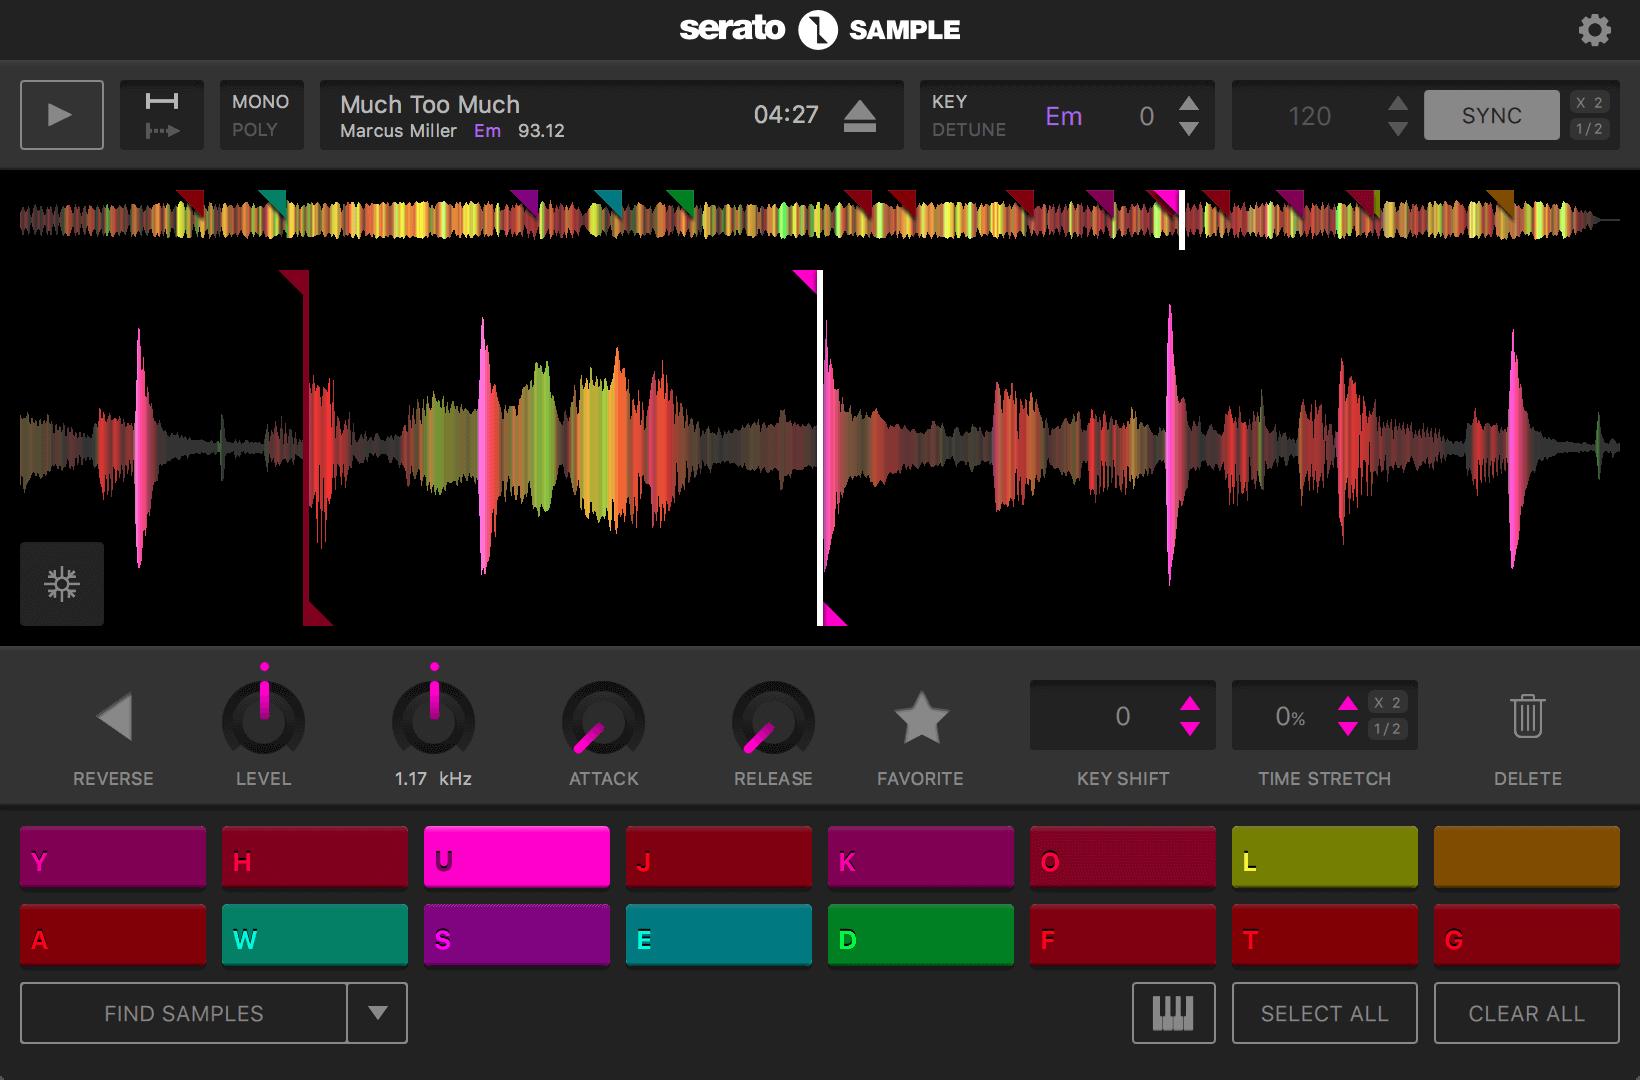 Serato Sample Flash Sale: Save 30% on the intuitive sampler plugin